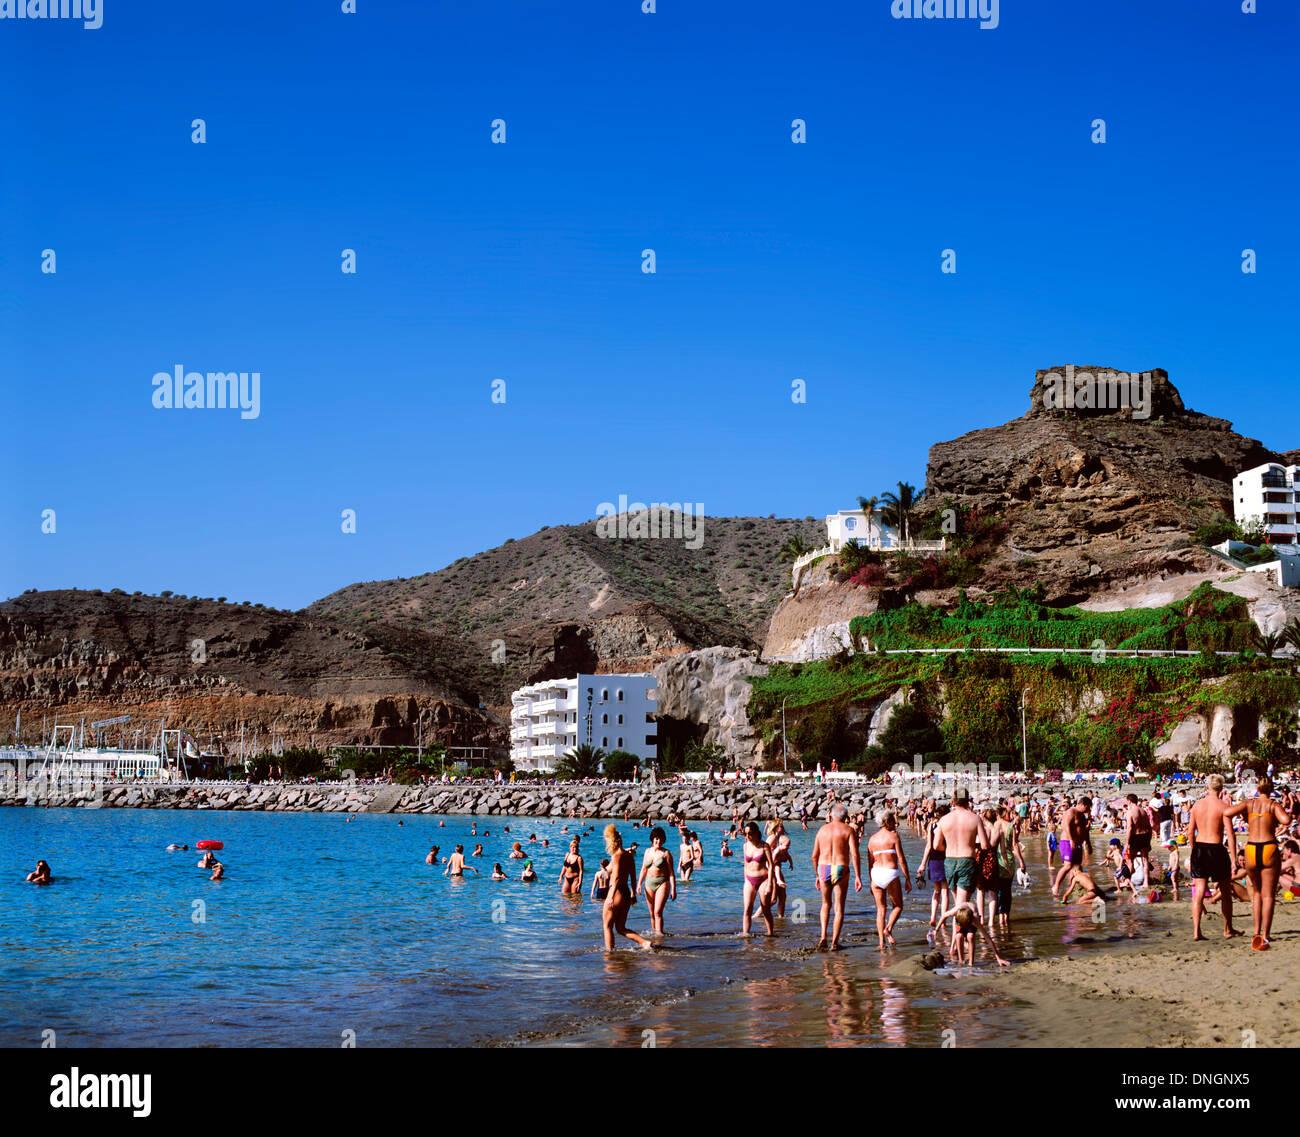 Urlauber am Strand, Puerto Rico, Gran Canaria, Spanien Stockbild